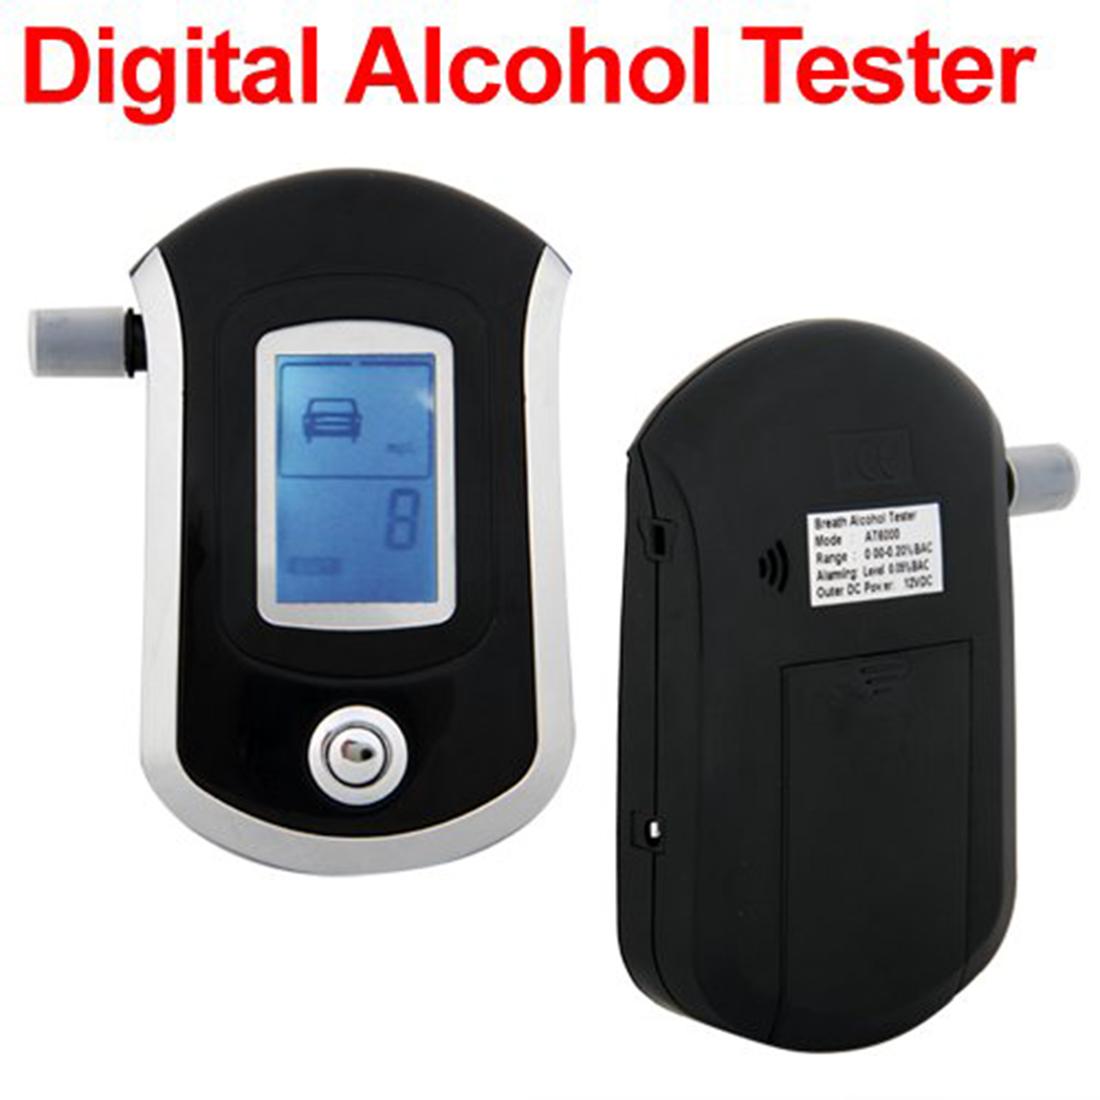 2015 Police Digital LCD Alcohol Breath Tester Analyzer Breathalizer Breathalyser High Quality Breathalyzer Free Shipping(China (Mainland))